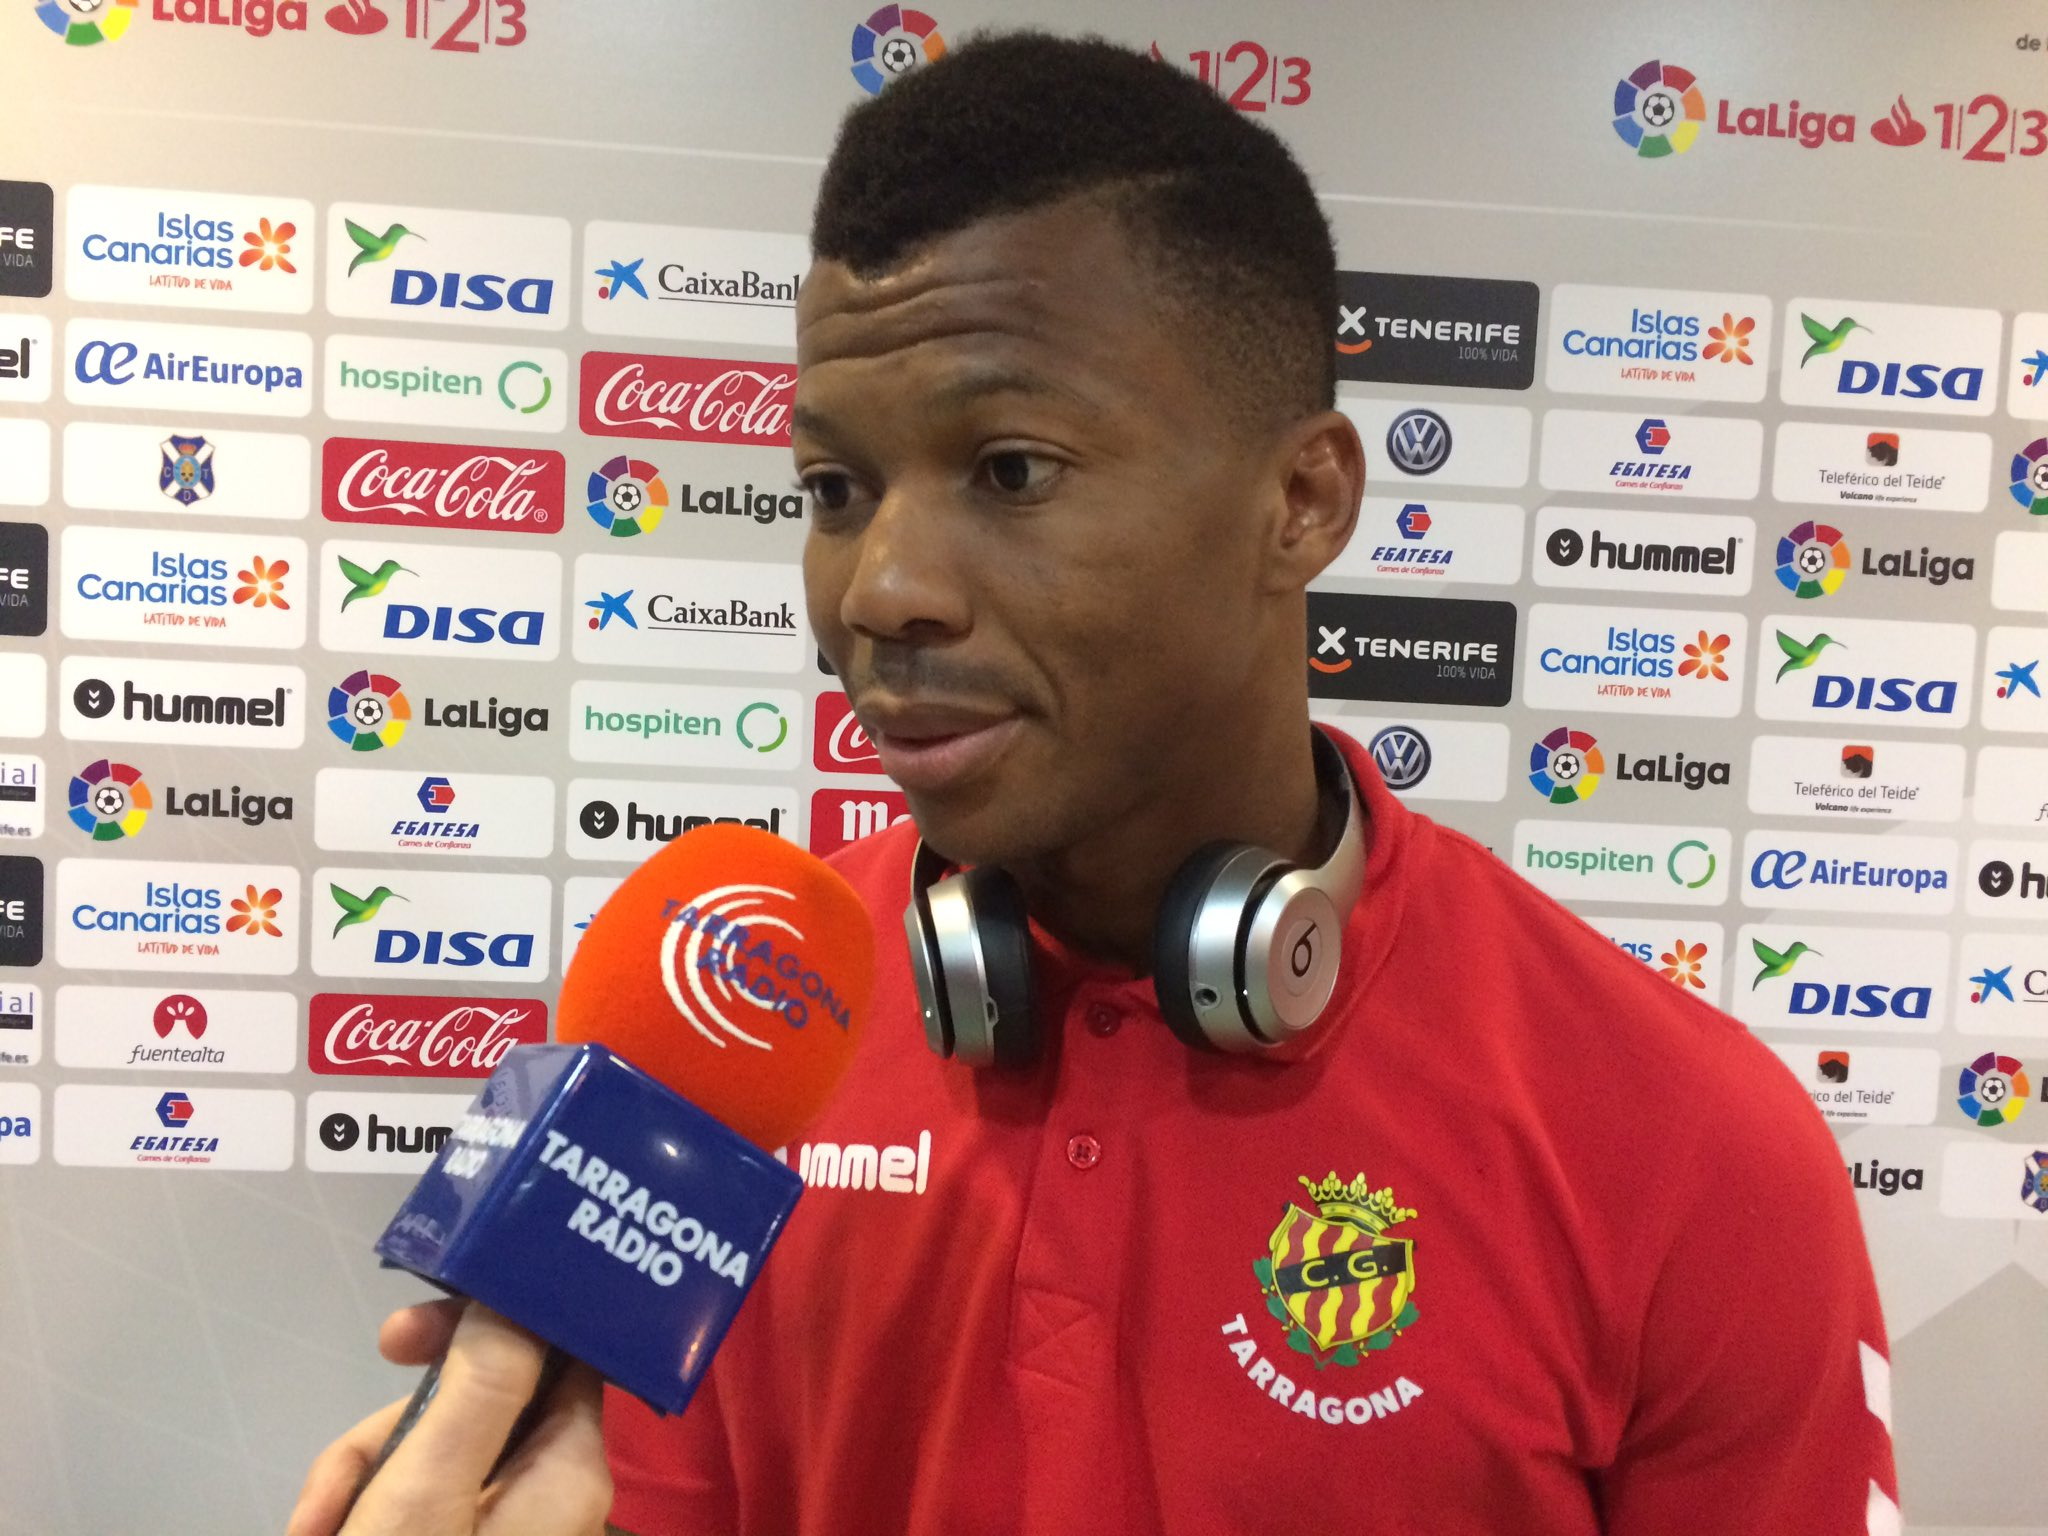 Ike Uche CelebratesGimnastic's Relegation Escape;Kalu Uche, Azeez Also Avoid Demotion With Almeria